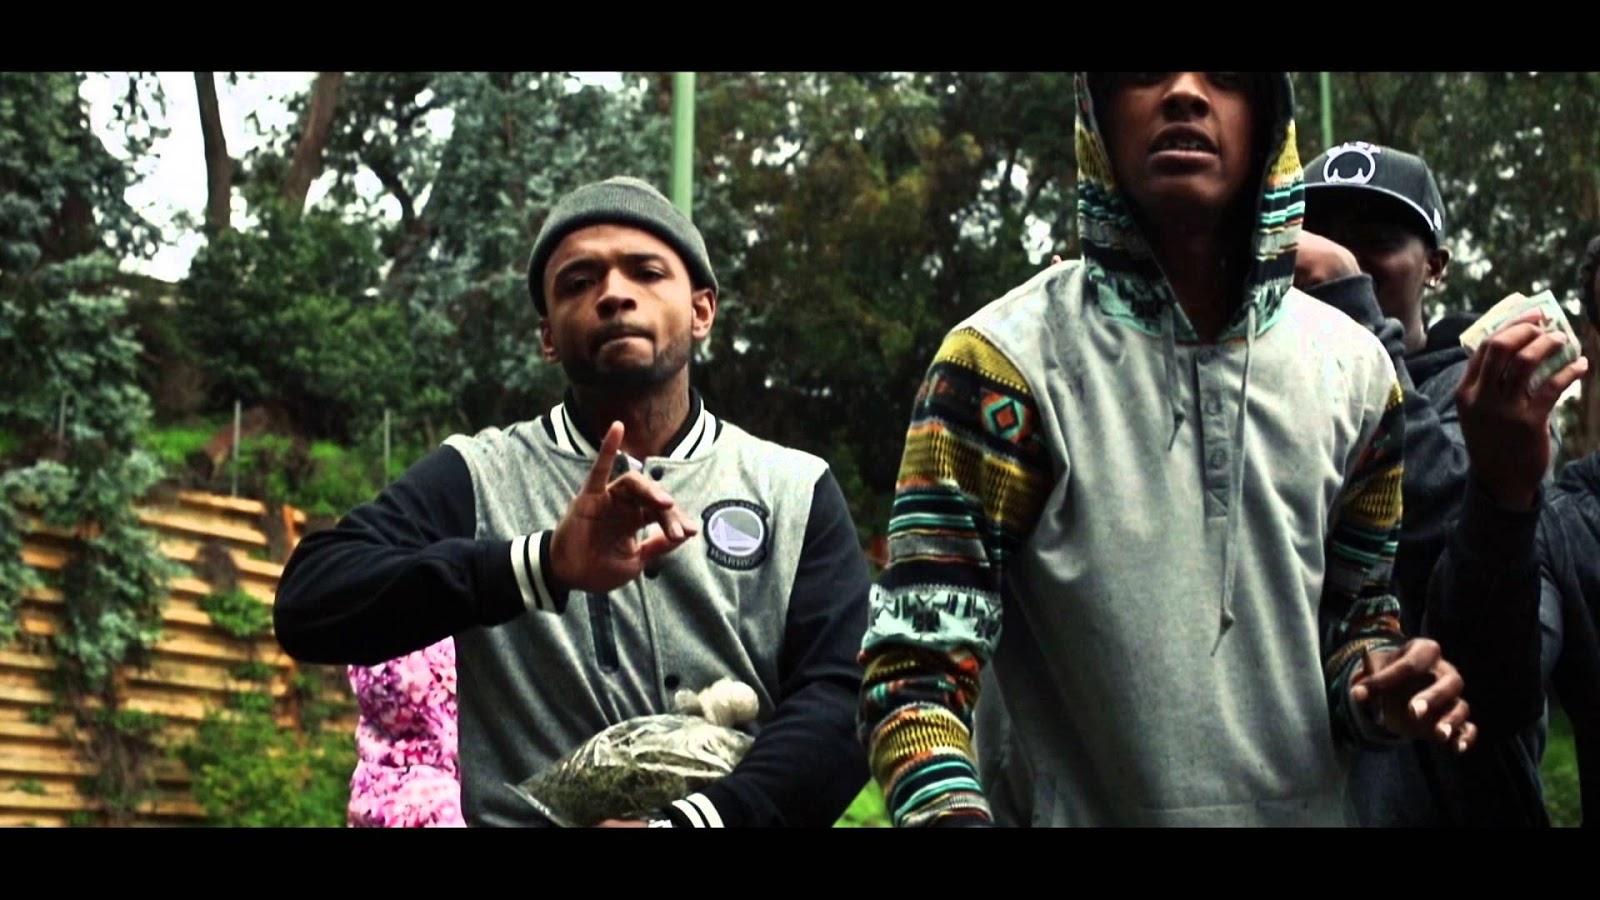 Philly B - On My Way (Feat. Fan Banga & Professor N.A.N) [Vídeo]